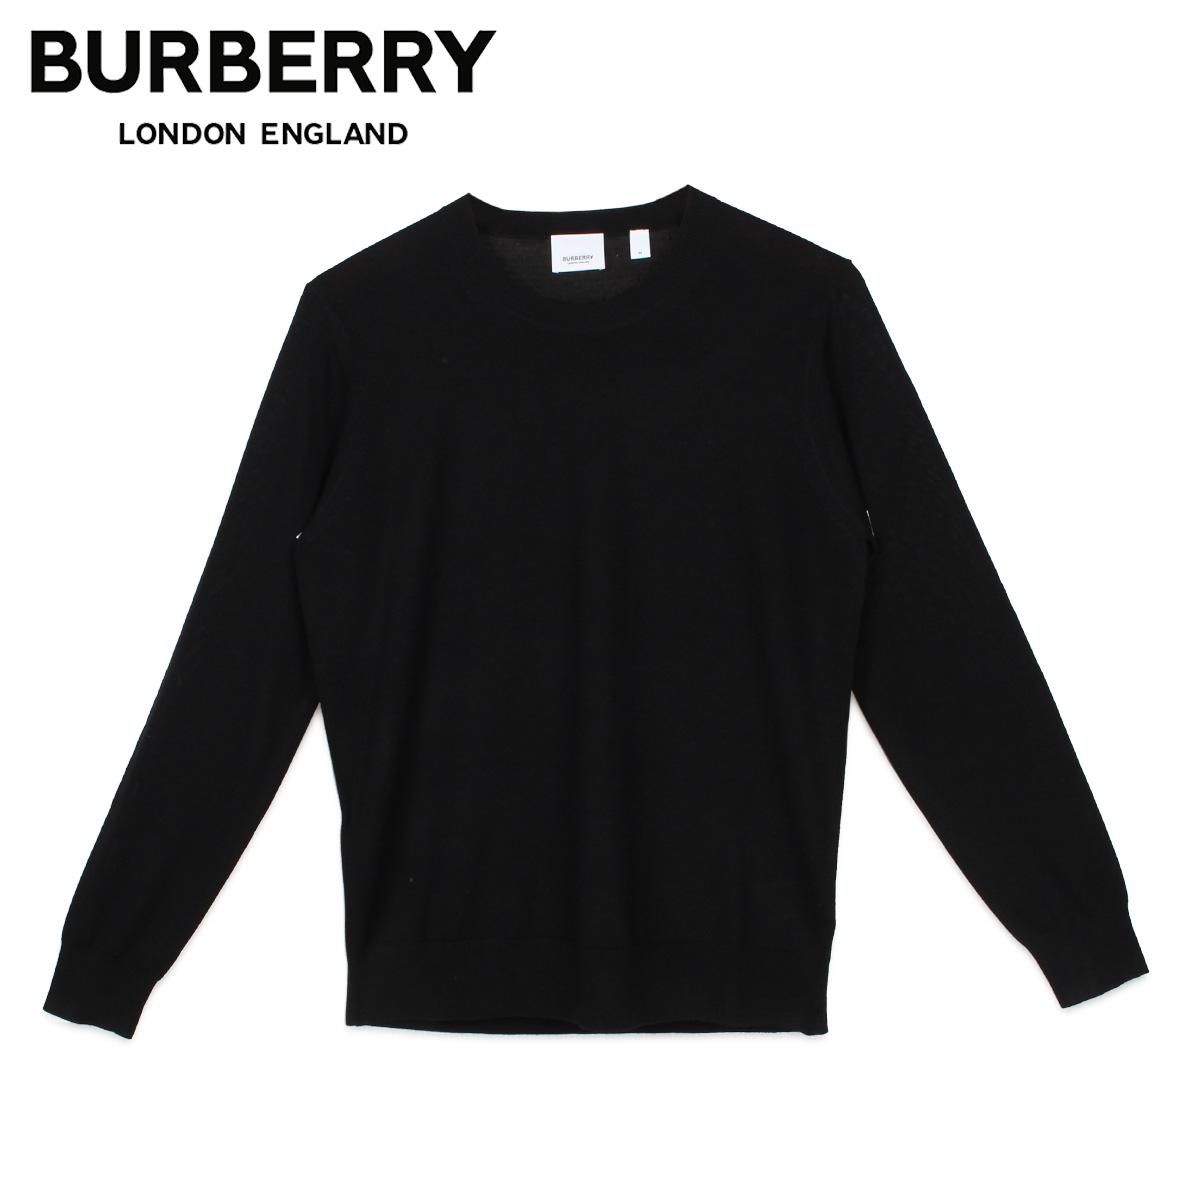 BURBERRY バーバリー ニット セーター レディース チェック ROUND NECK KNIT ブラック 黒 8017019